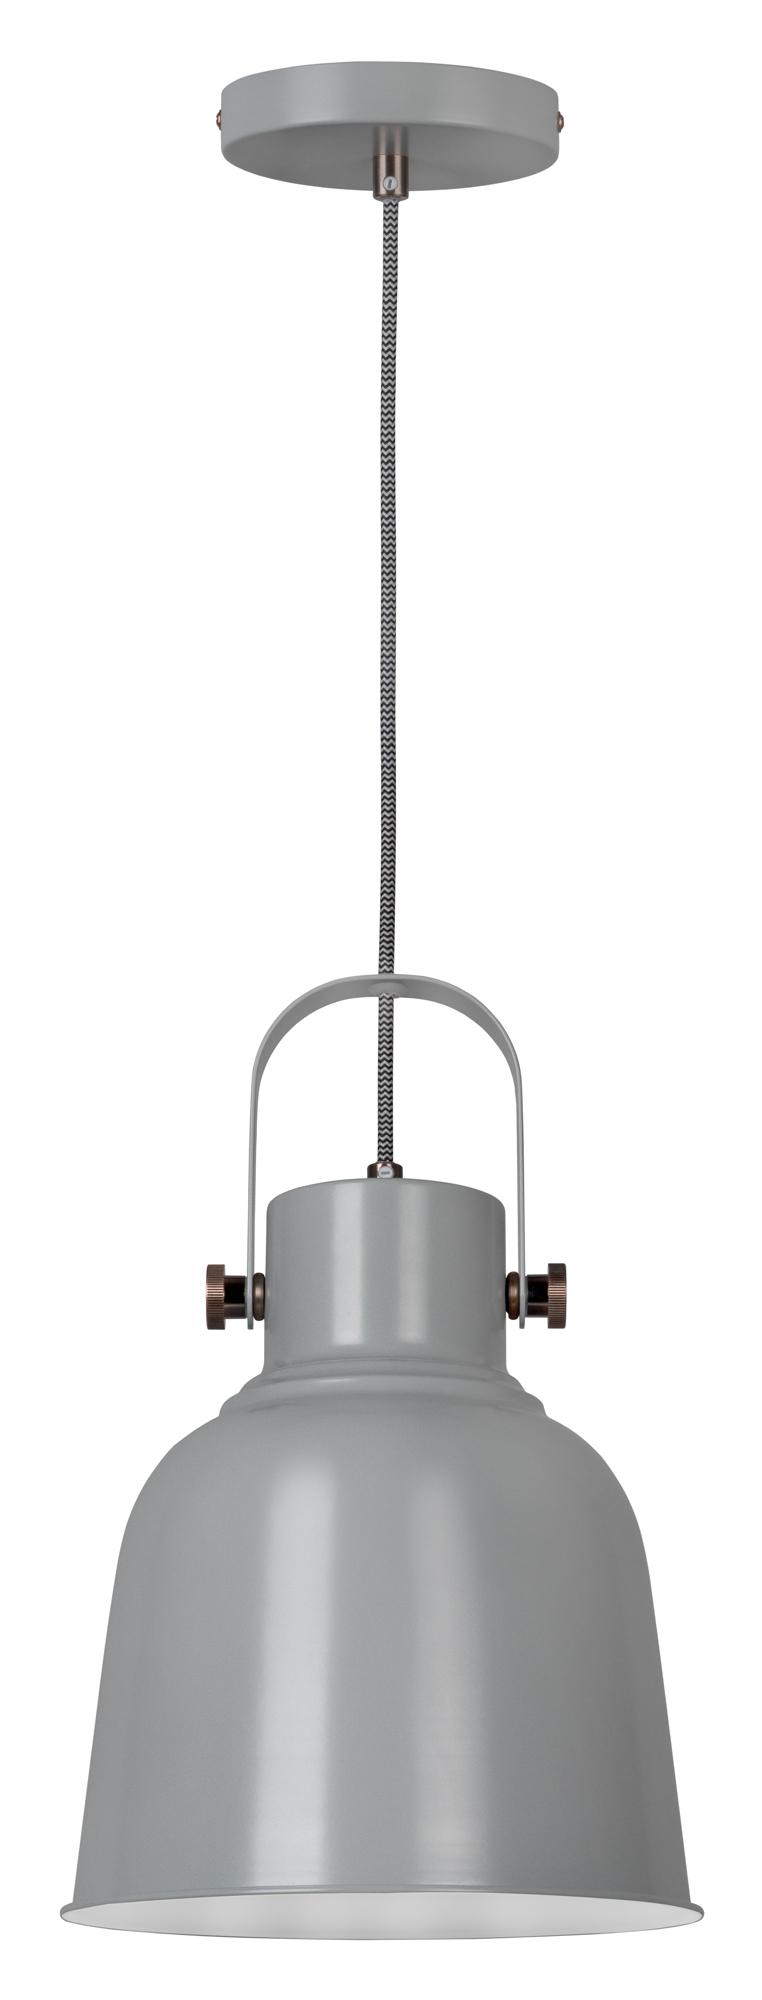 Lampa wiszaca Activejet szara AJE-LOLY Grey 1xE27